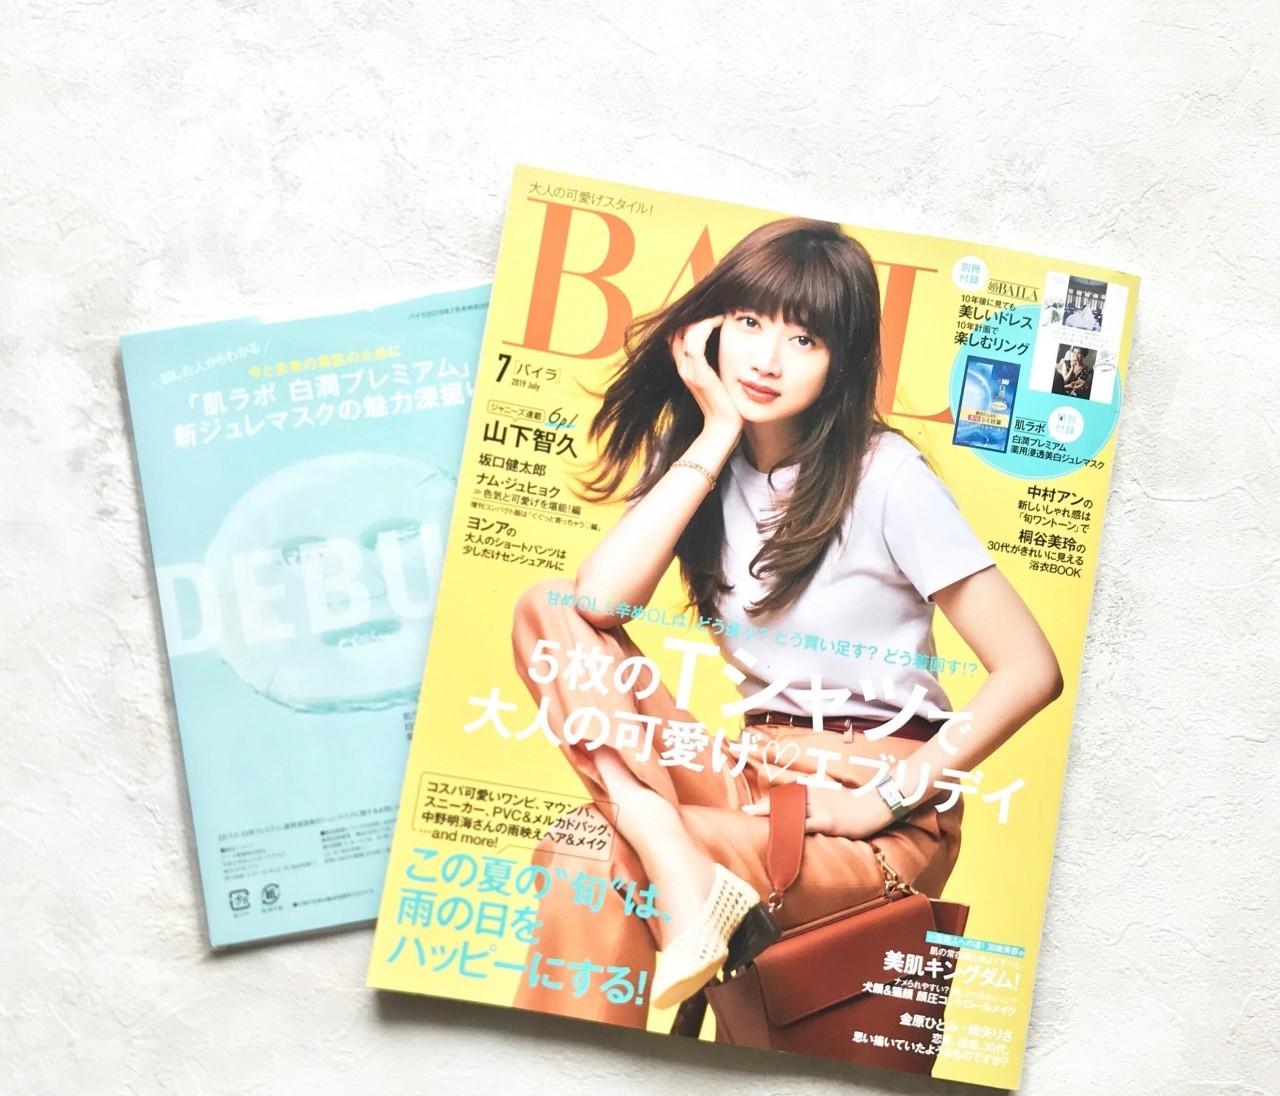 BAILA7月号発売!今月の読みどころは?